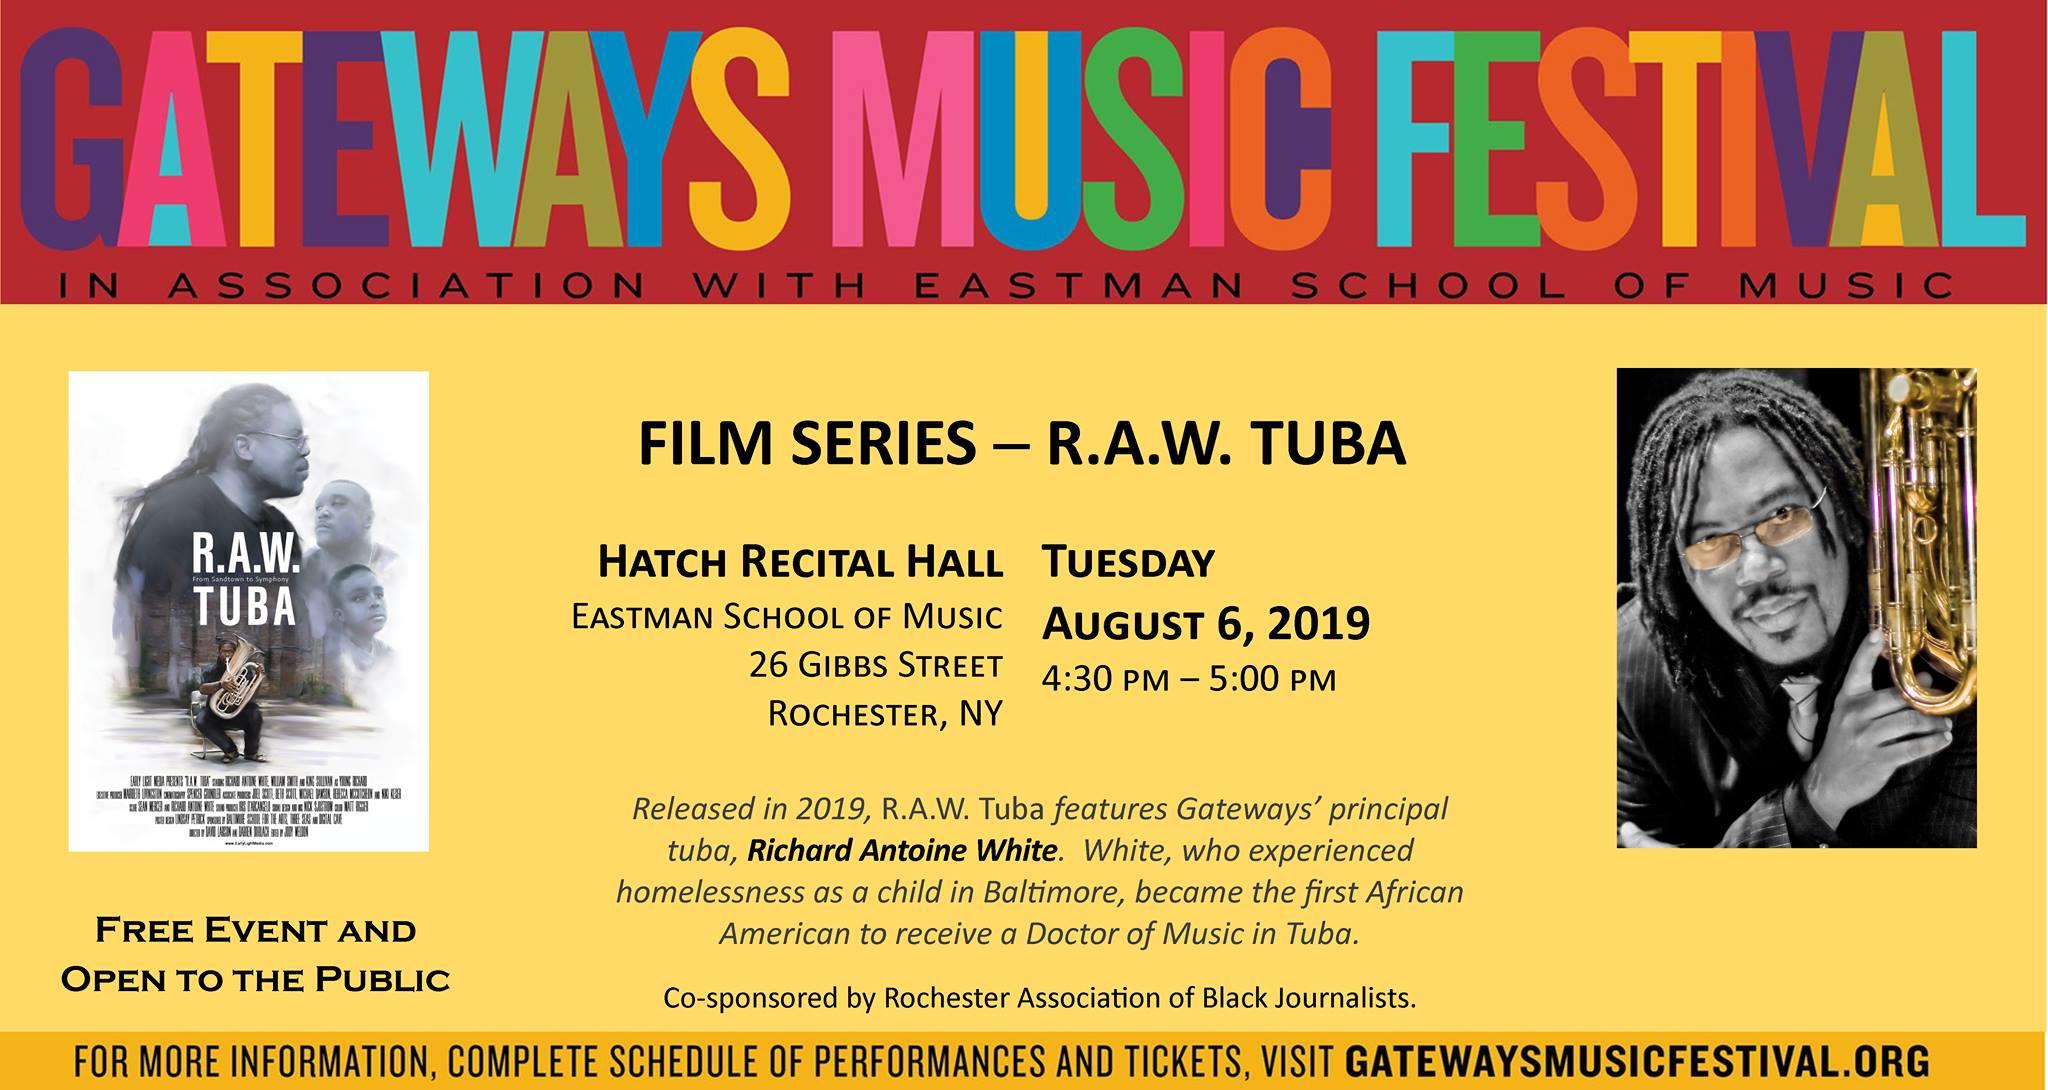 2019 GATEWAYS MUSIC FESTIVAL FILM SERIES: